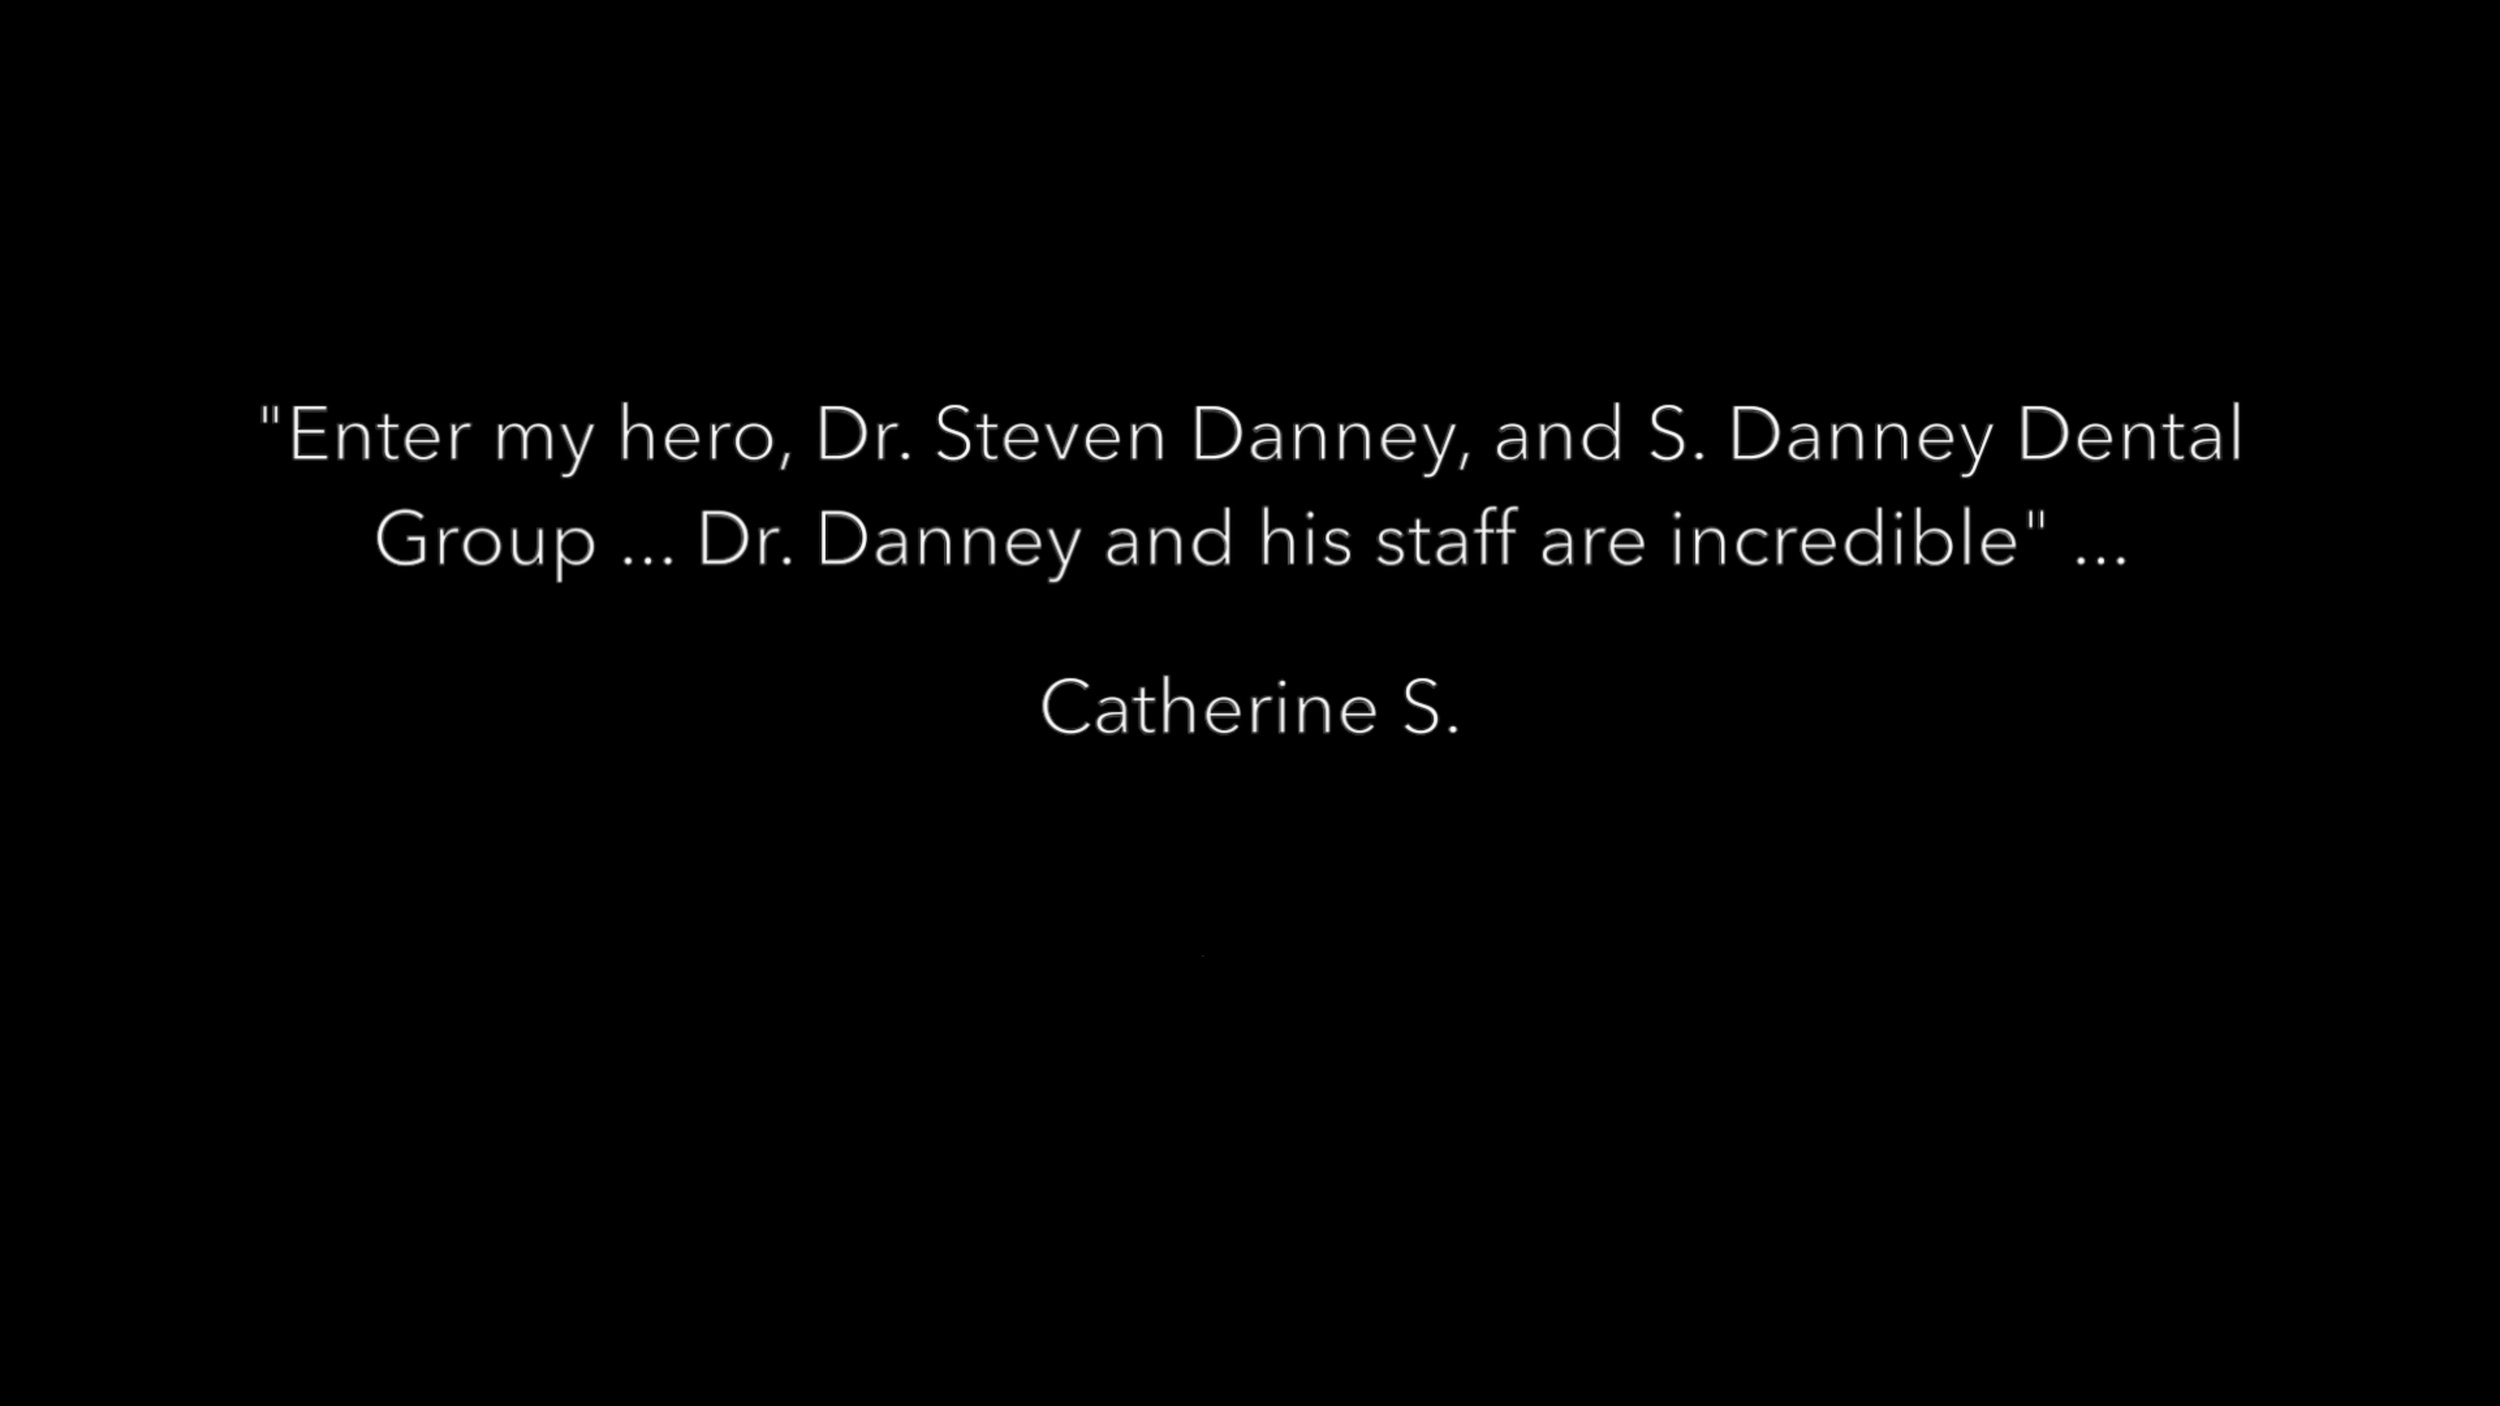 Catherine-S.-Testamonial-web.jpg